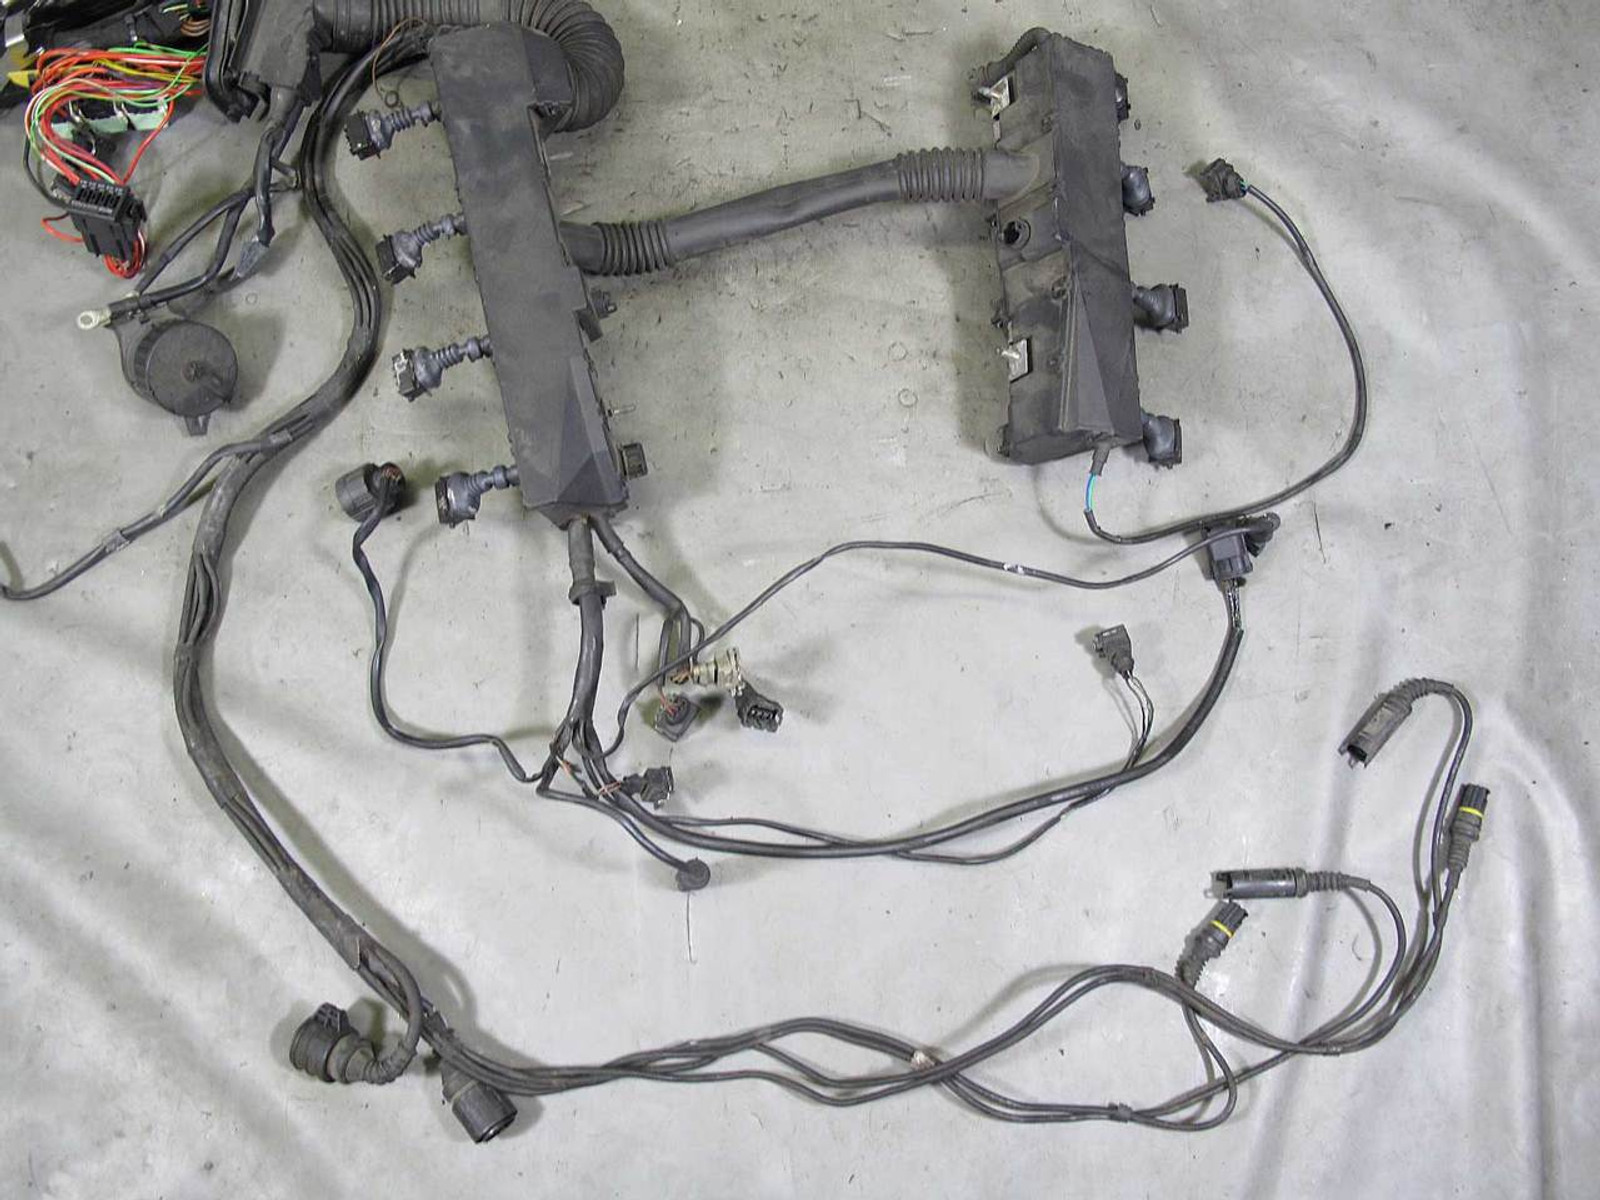 medium resolution of bmw 740il engine wiring harness wiring diagram third level 1998 bmw 740il body kit 1996 1997